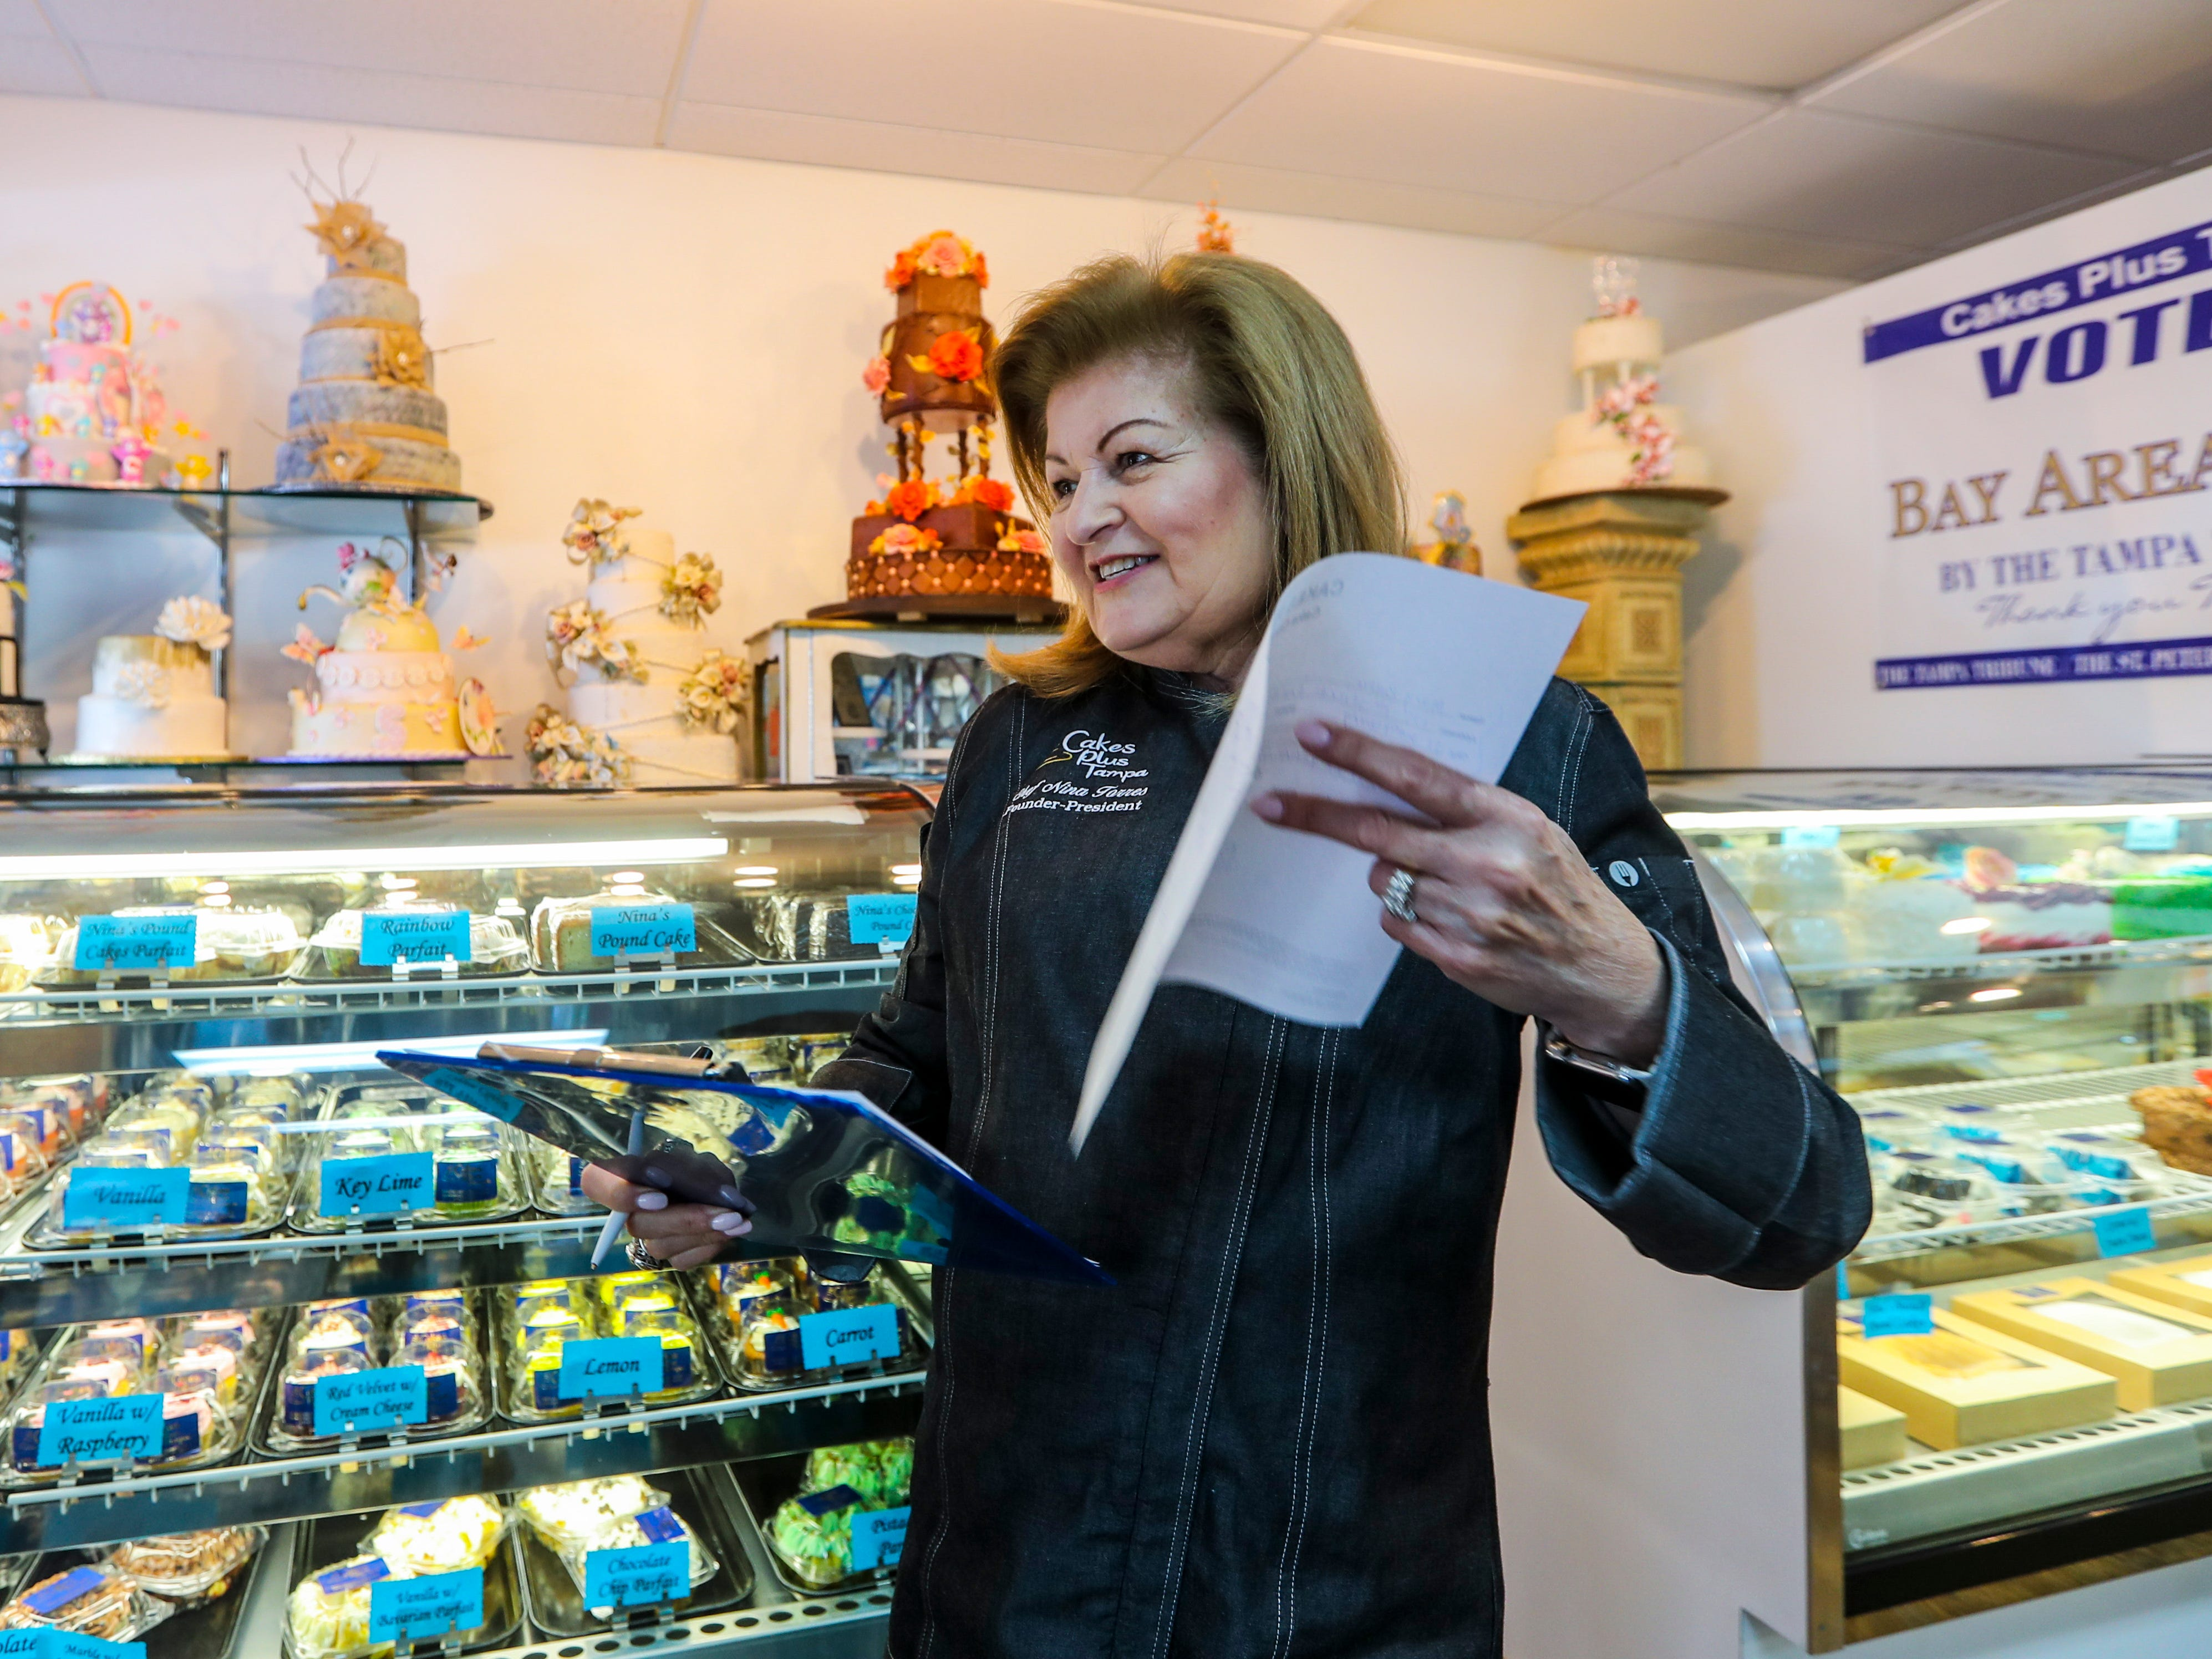 After 26 years, Cakes Plus owner Nina Torres is tasting sweet success